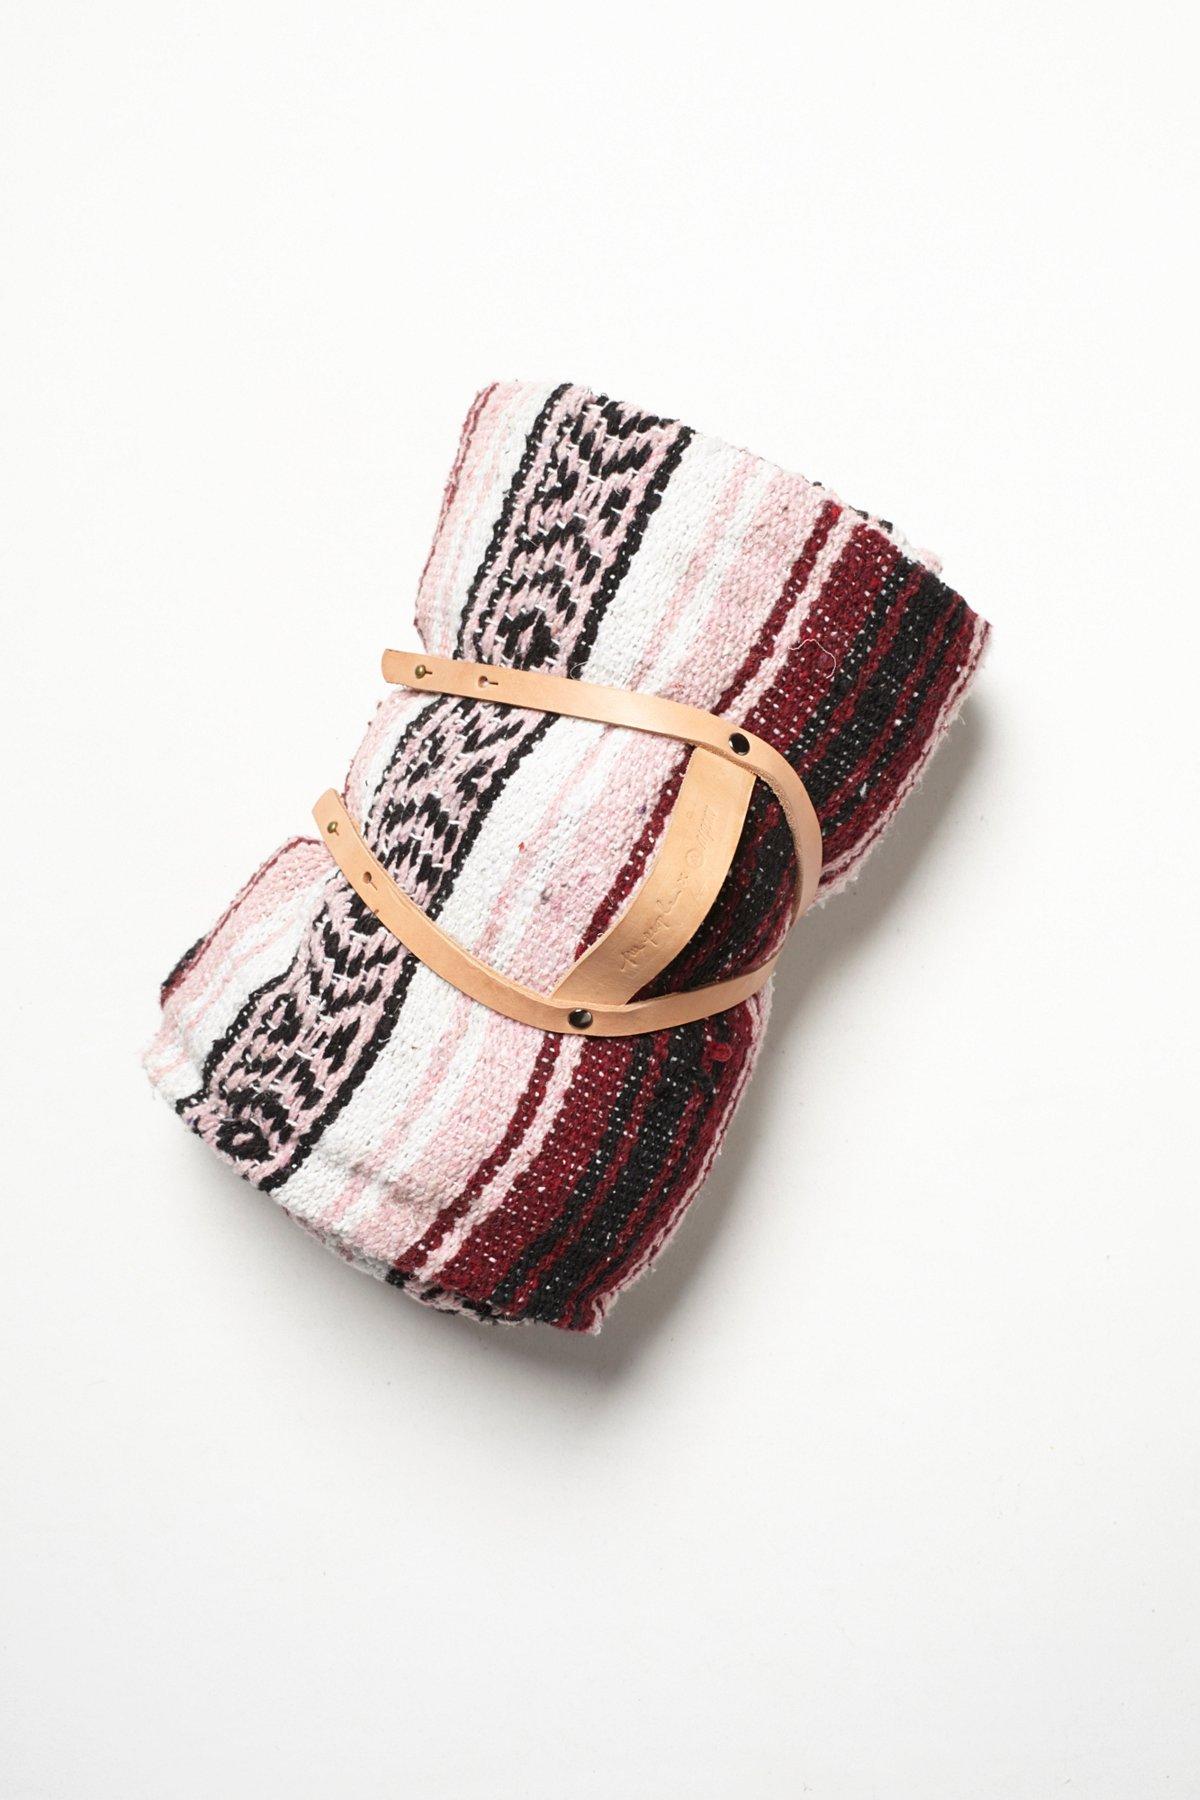 FP x Nipomo毛毯包